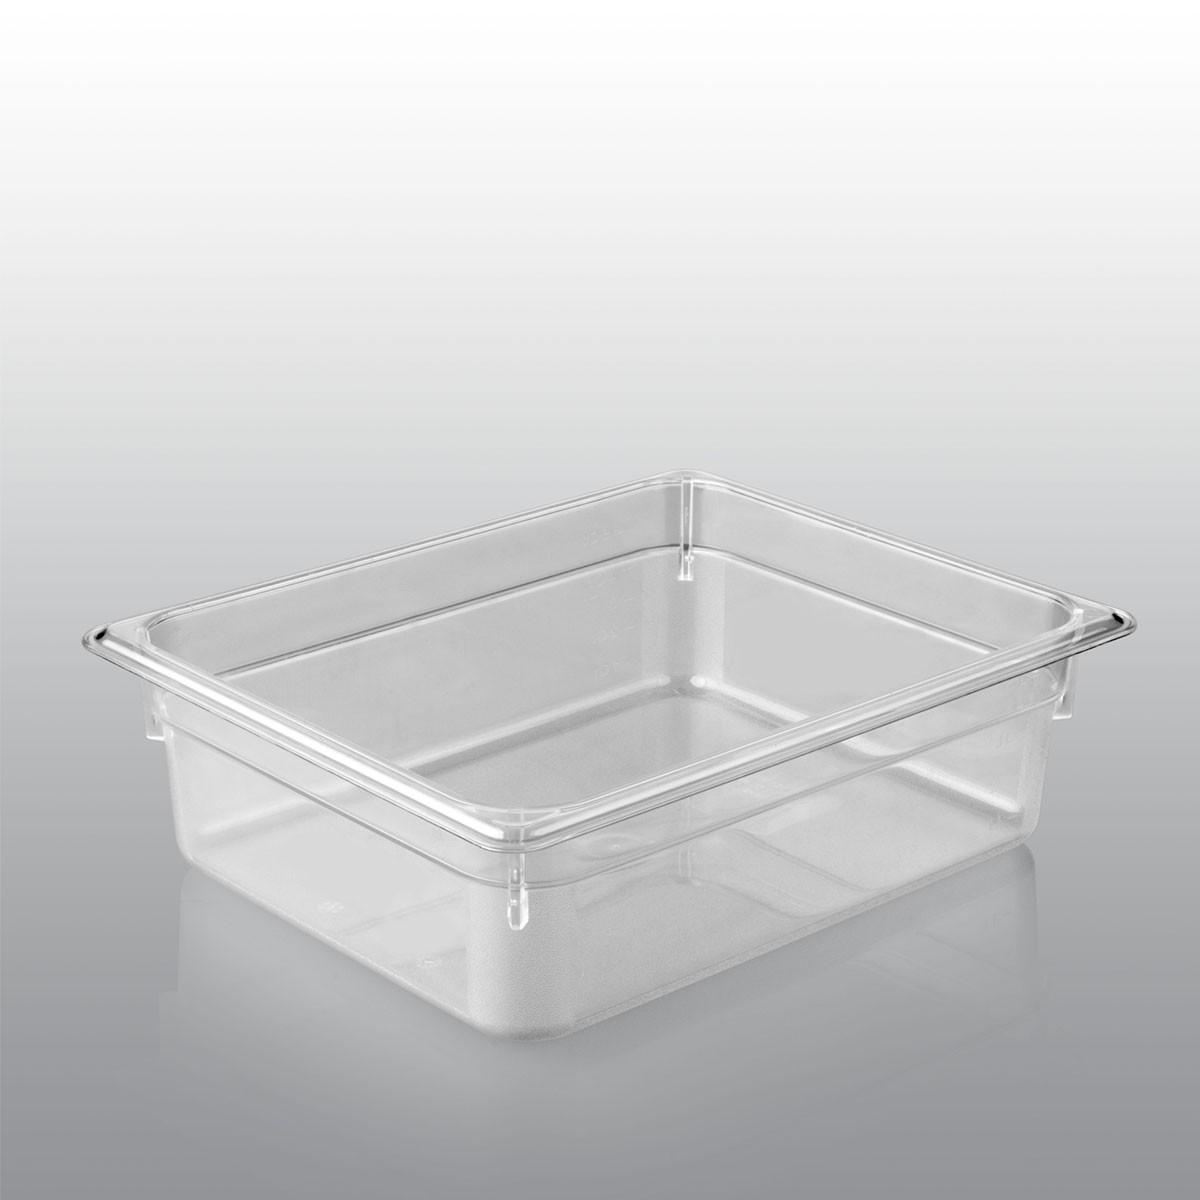 GN Behälter GN 1/2 aus Polycarbonat (Tiefe: 65mm) 4,0 L Saro